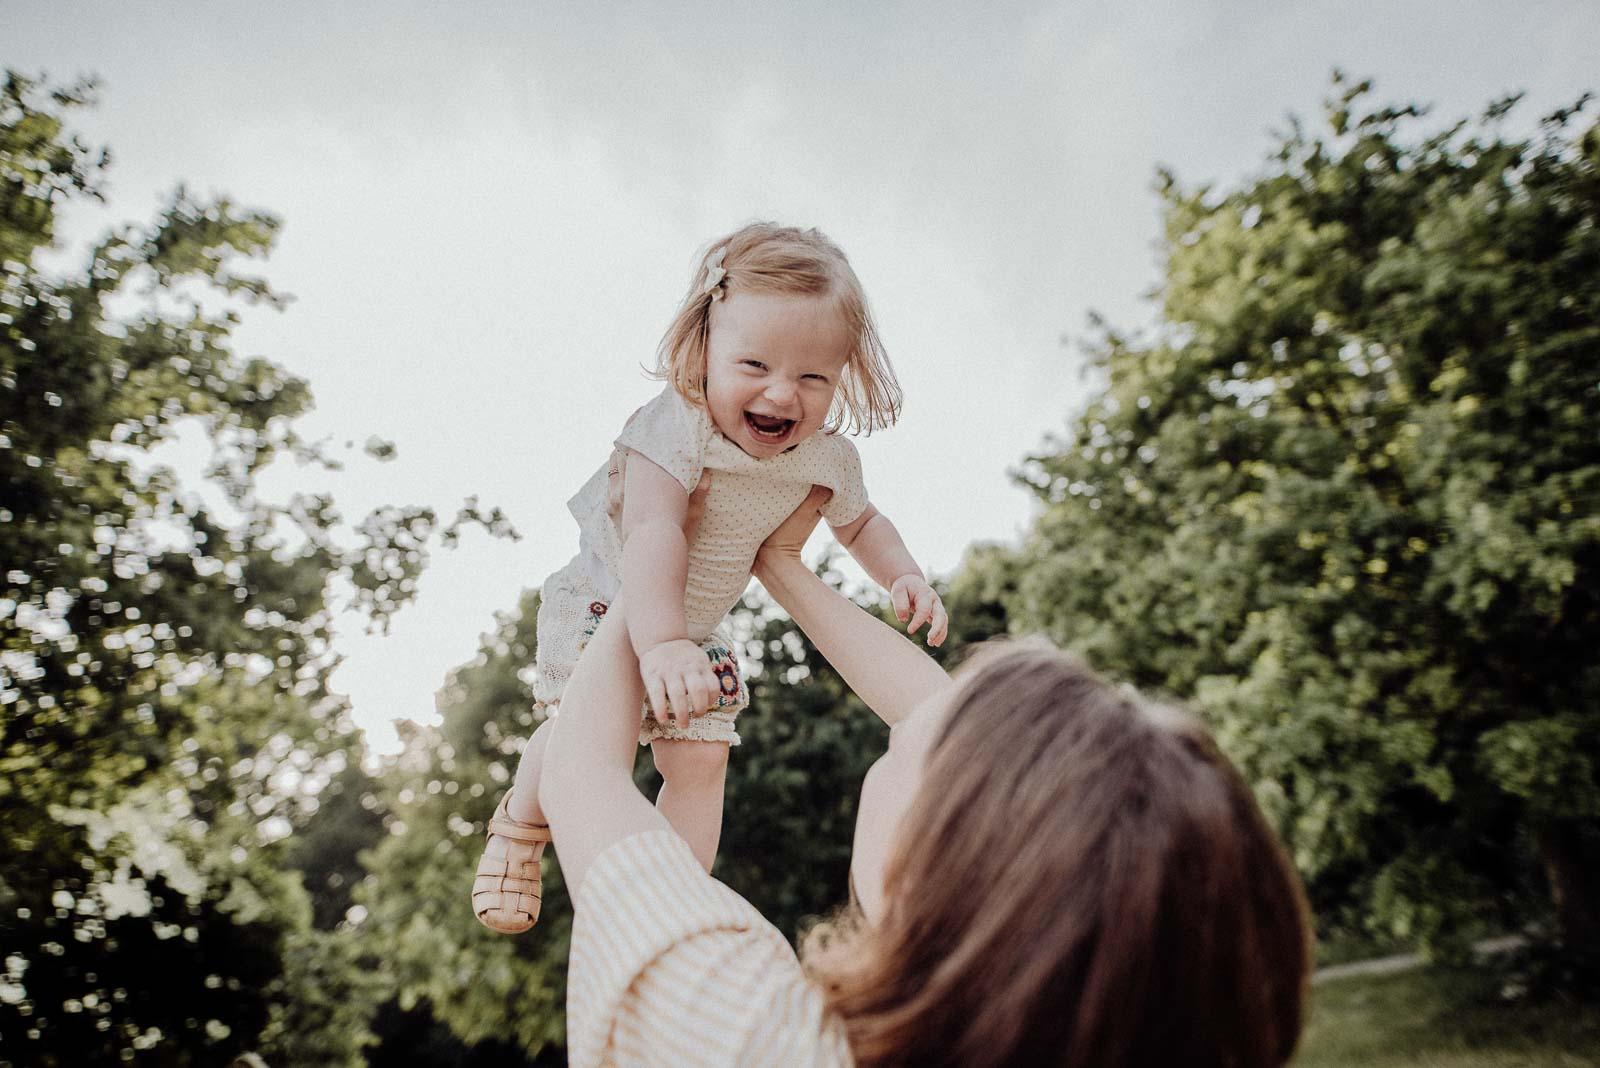 034-familien-fotoshooting-herne-heide